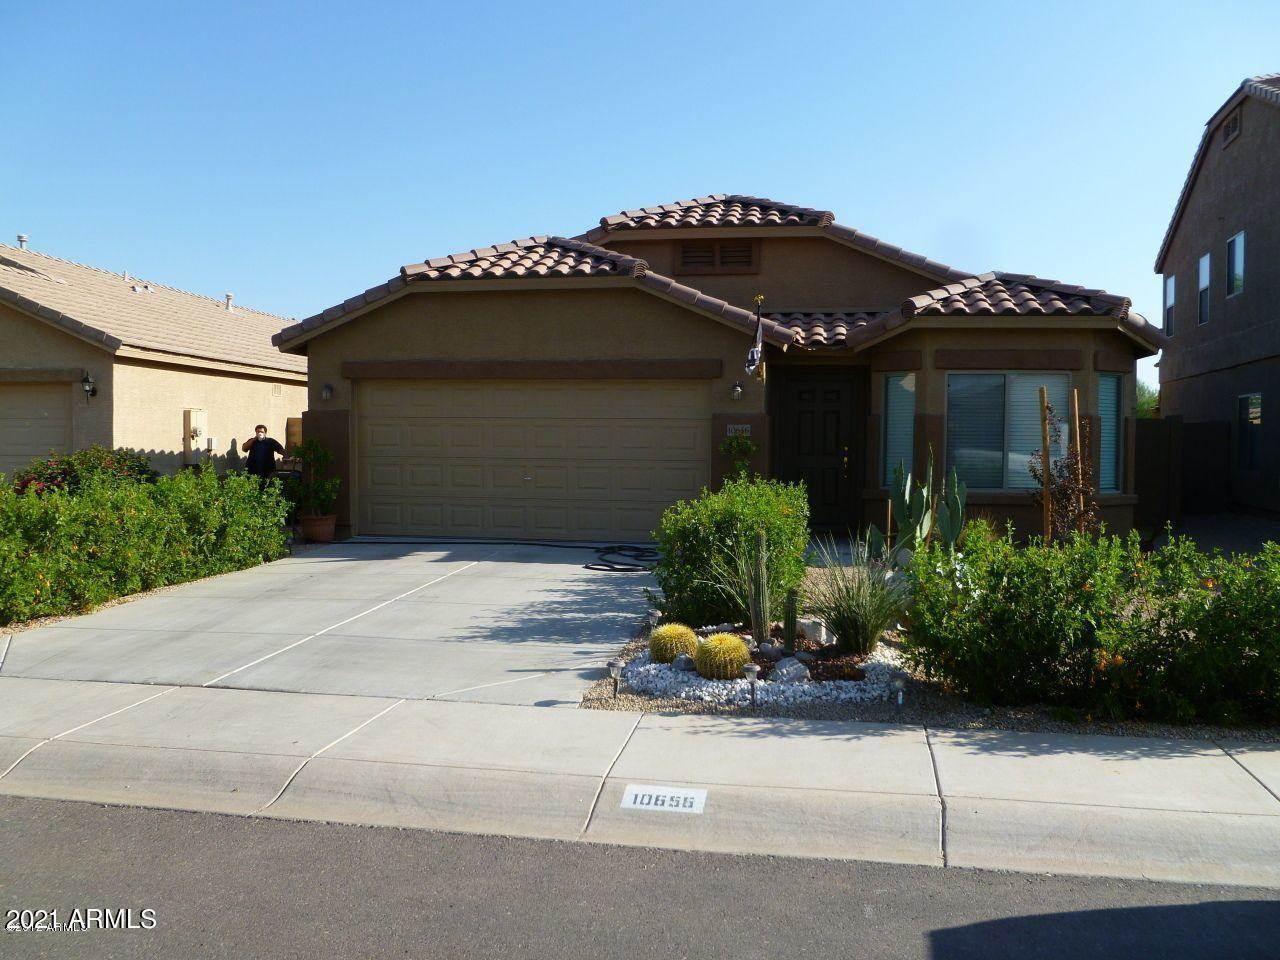 10656 East Wallflower Lane, Florence, AZ 85132